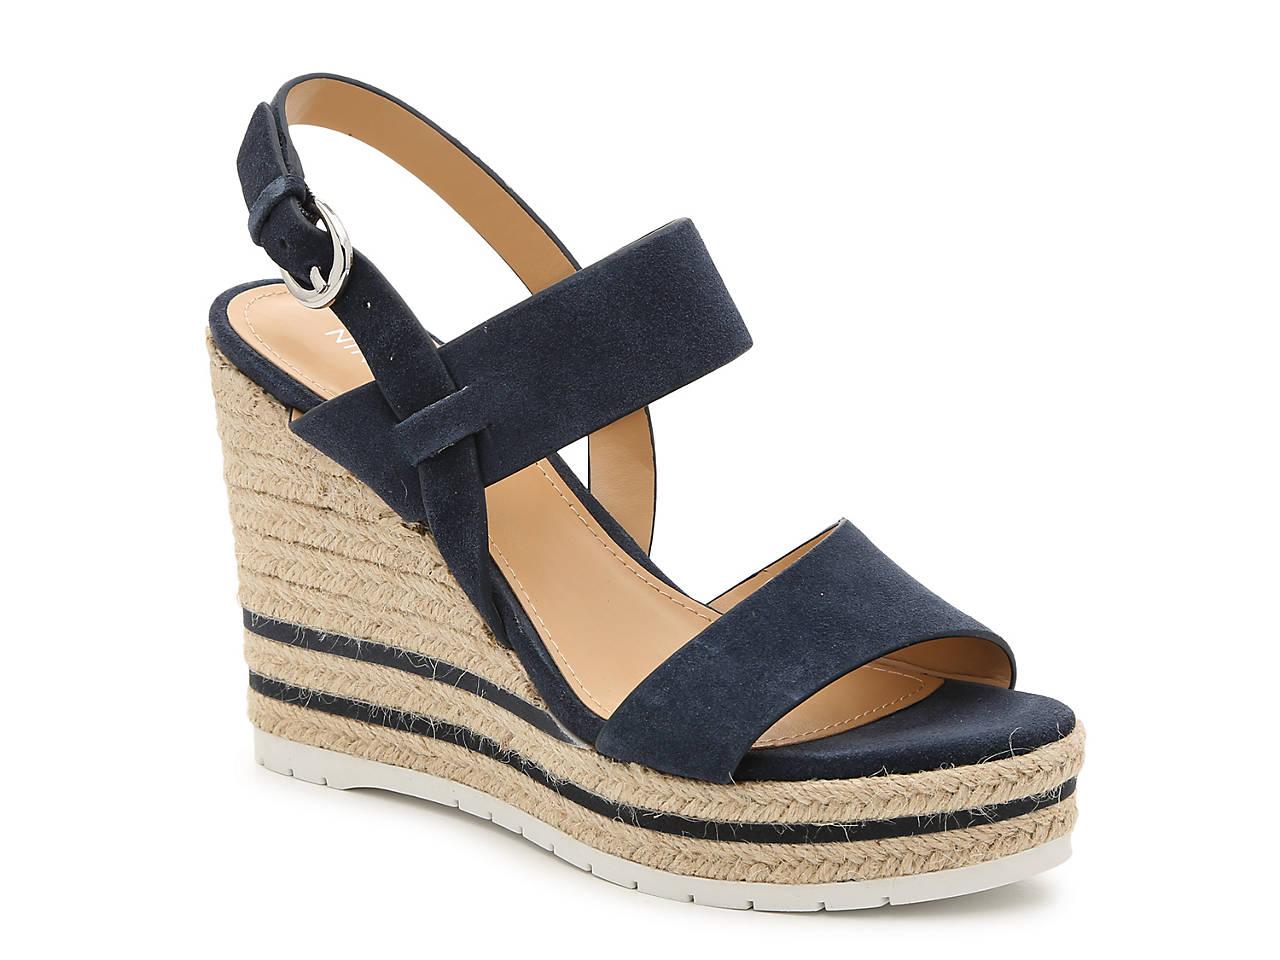 Alivia Espadrille Wedge Sandal by Nine West